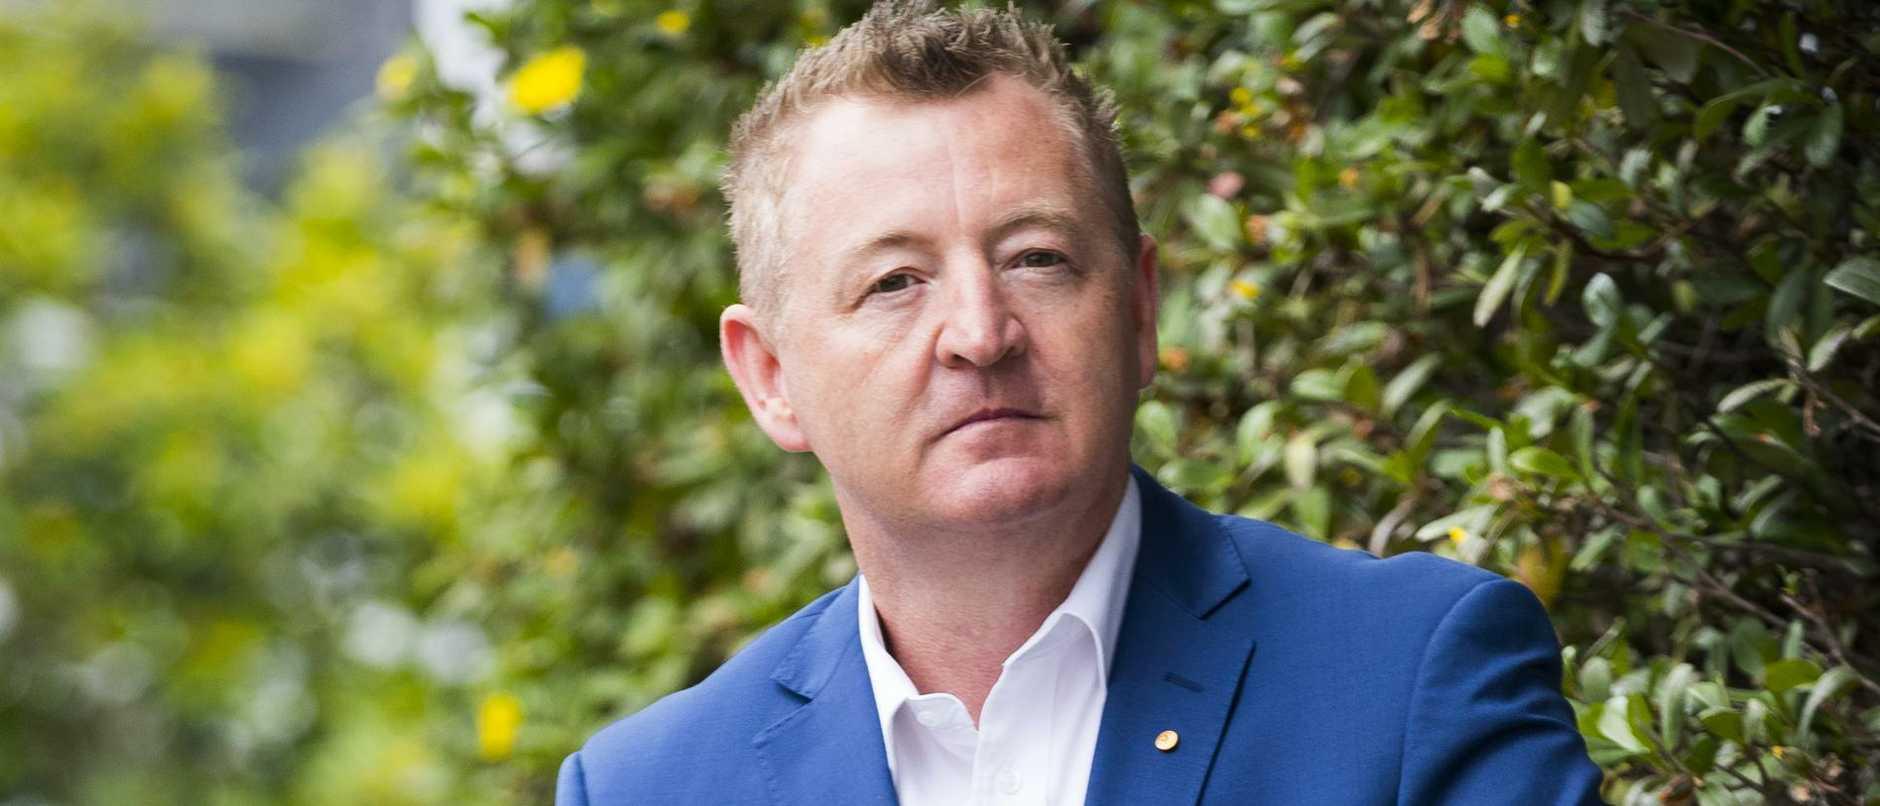 Luke Mangan: Berejiklian needs to relieve NSW from strict COVID rules